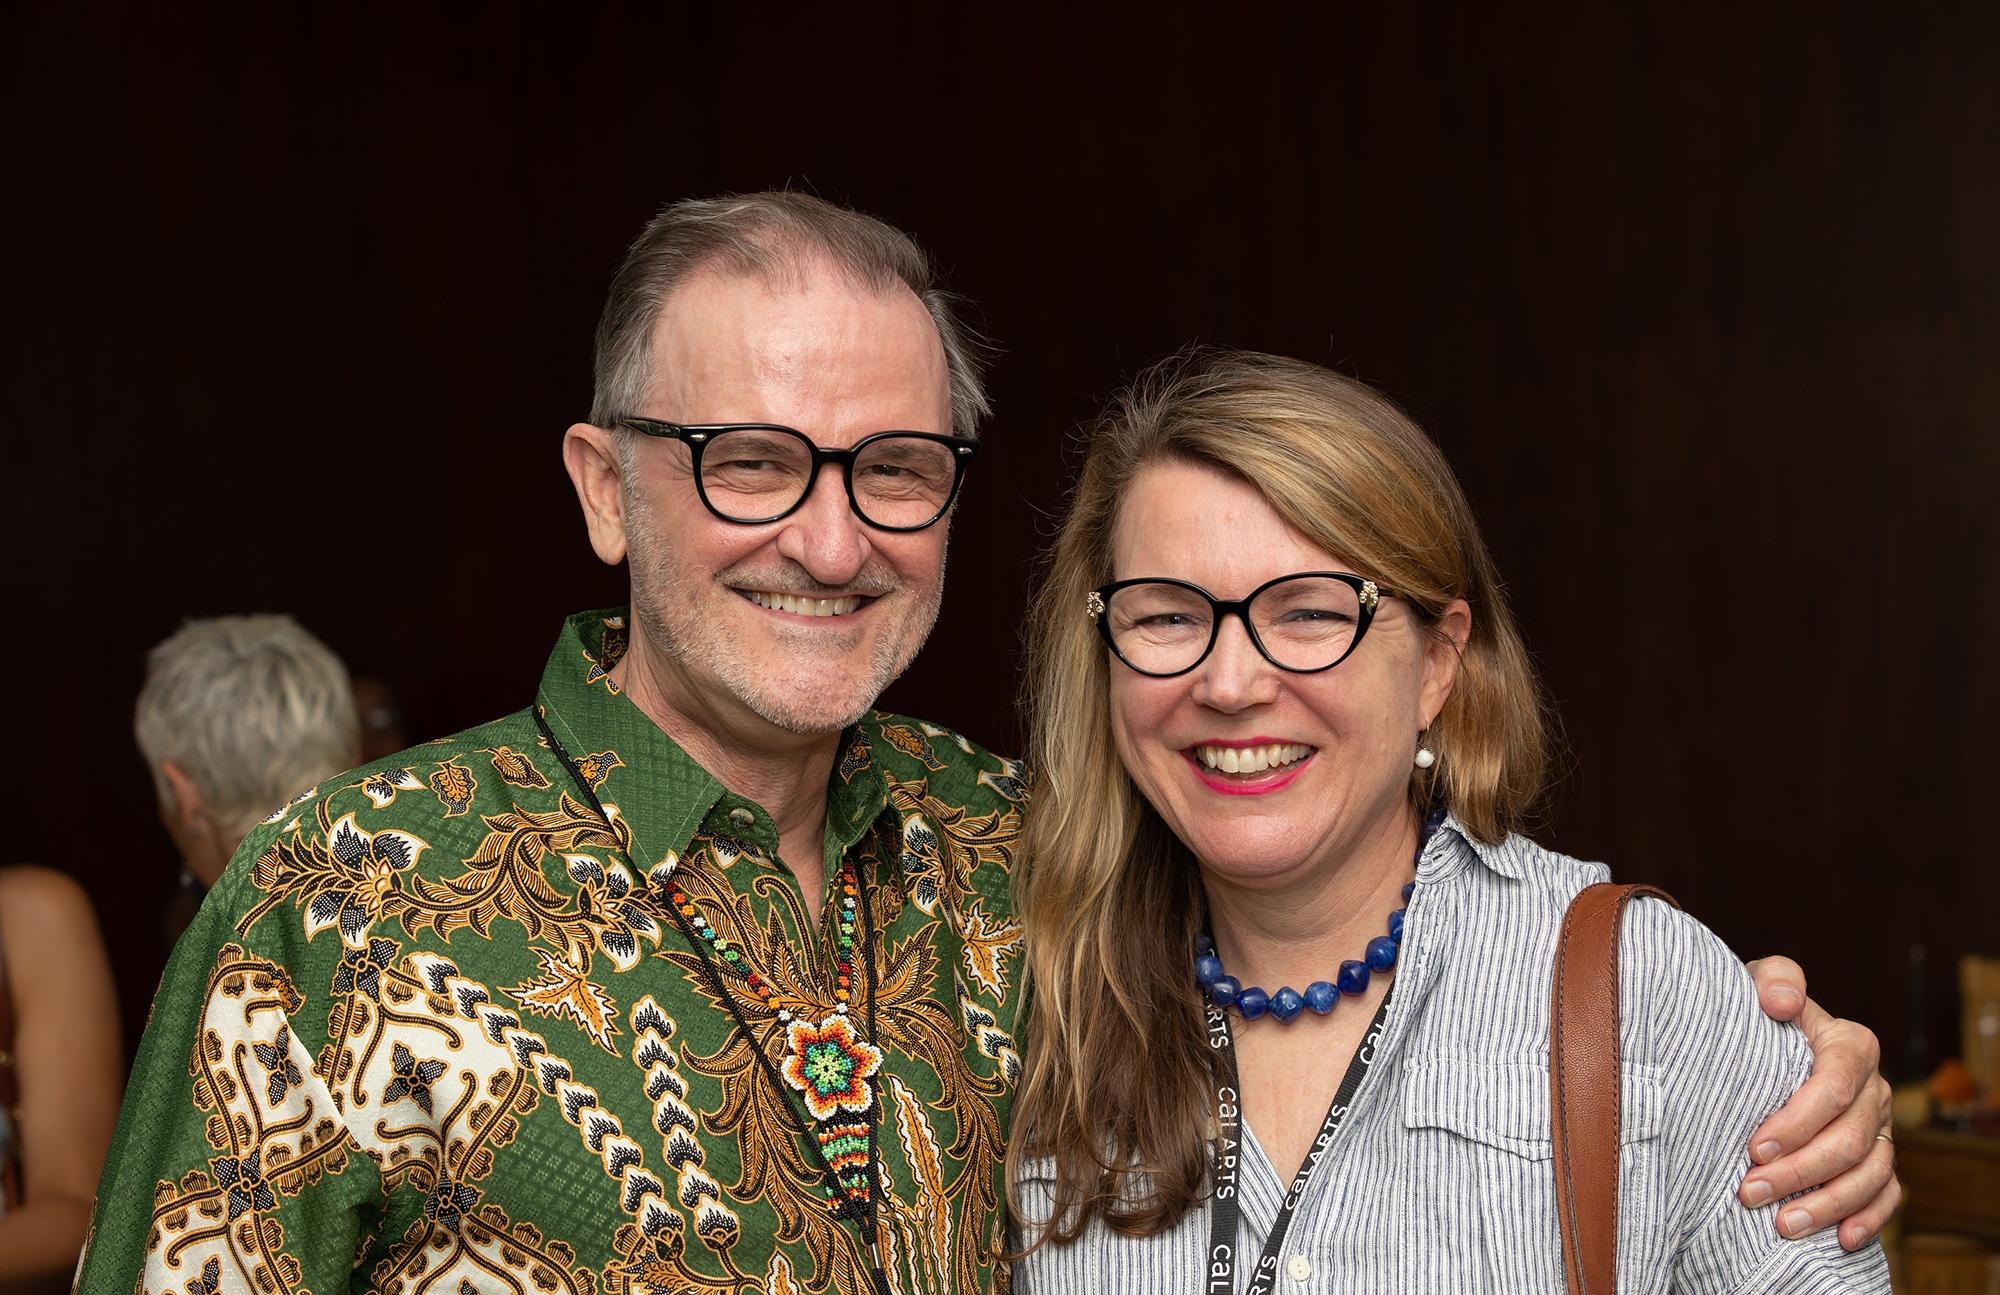 David Rosenboom and Nicki Voss (BFA 88, MFA 90).